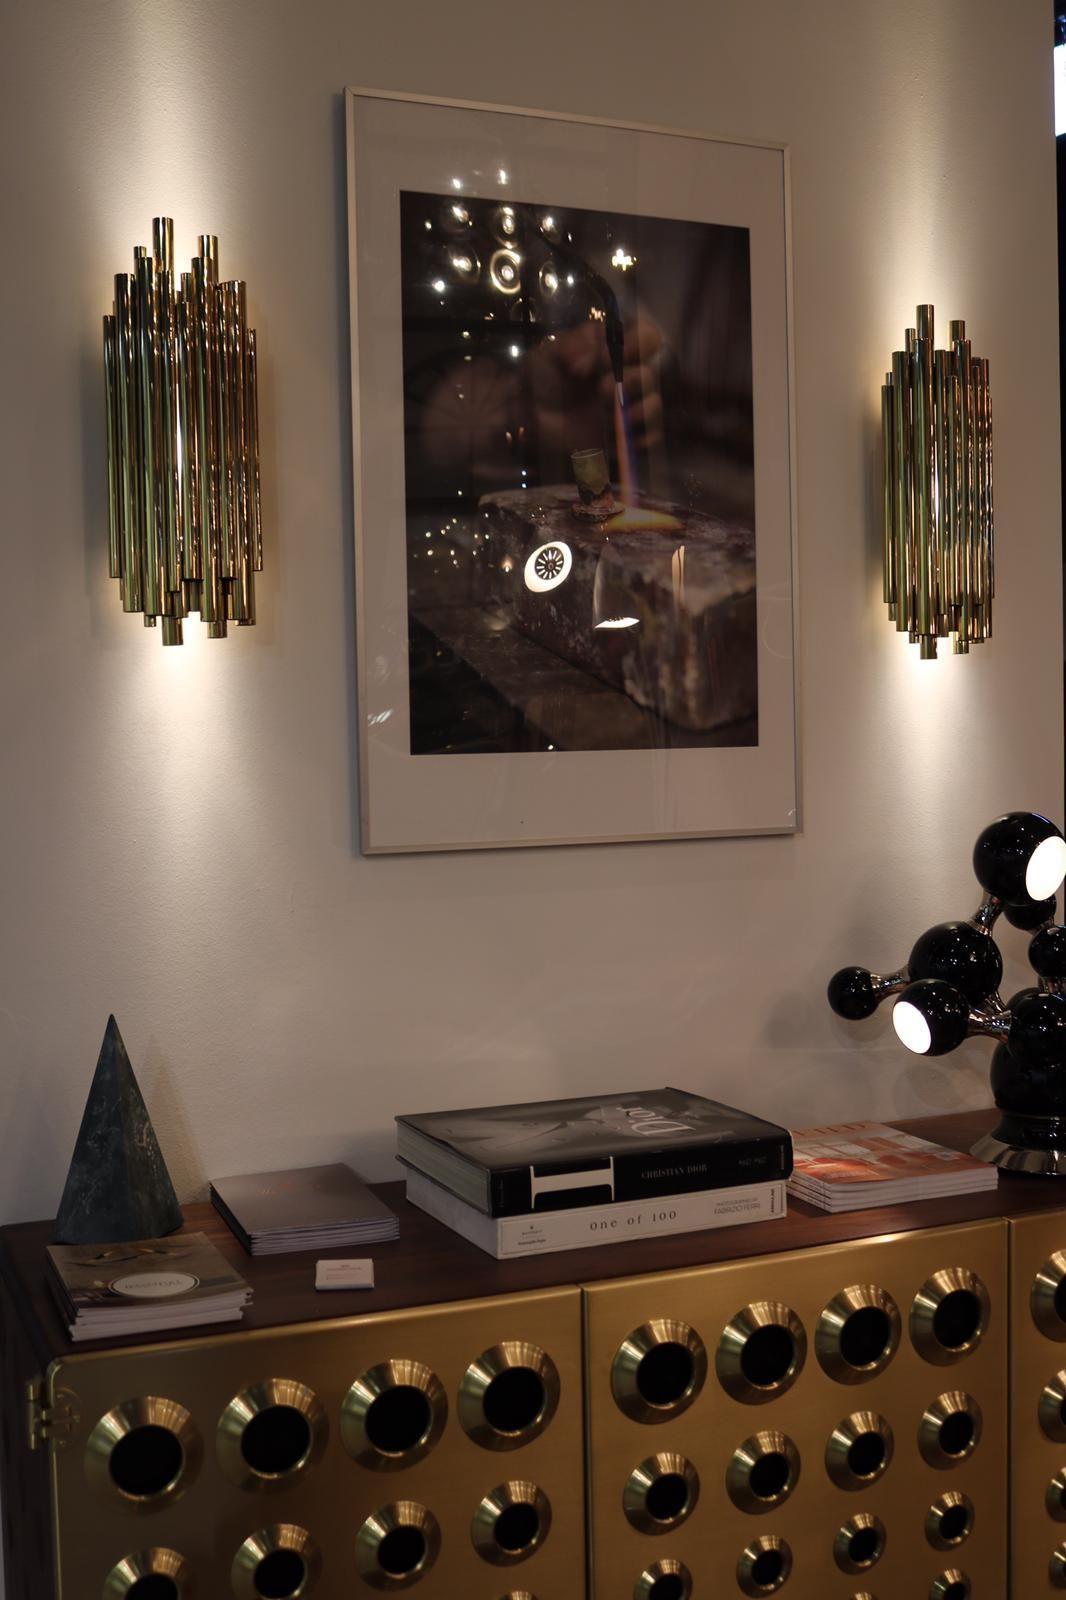 Top 5 Luxury Interior Design Trends For 2019 Luxury Interior Design Luxury Interior Interior Design